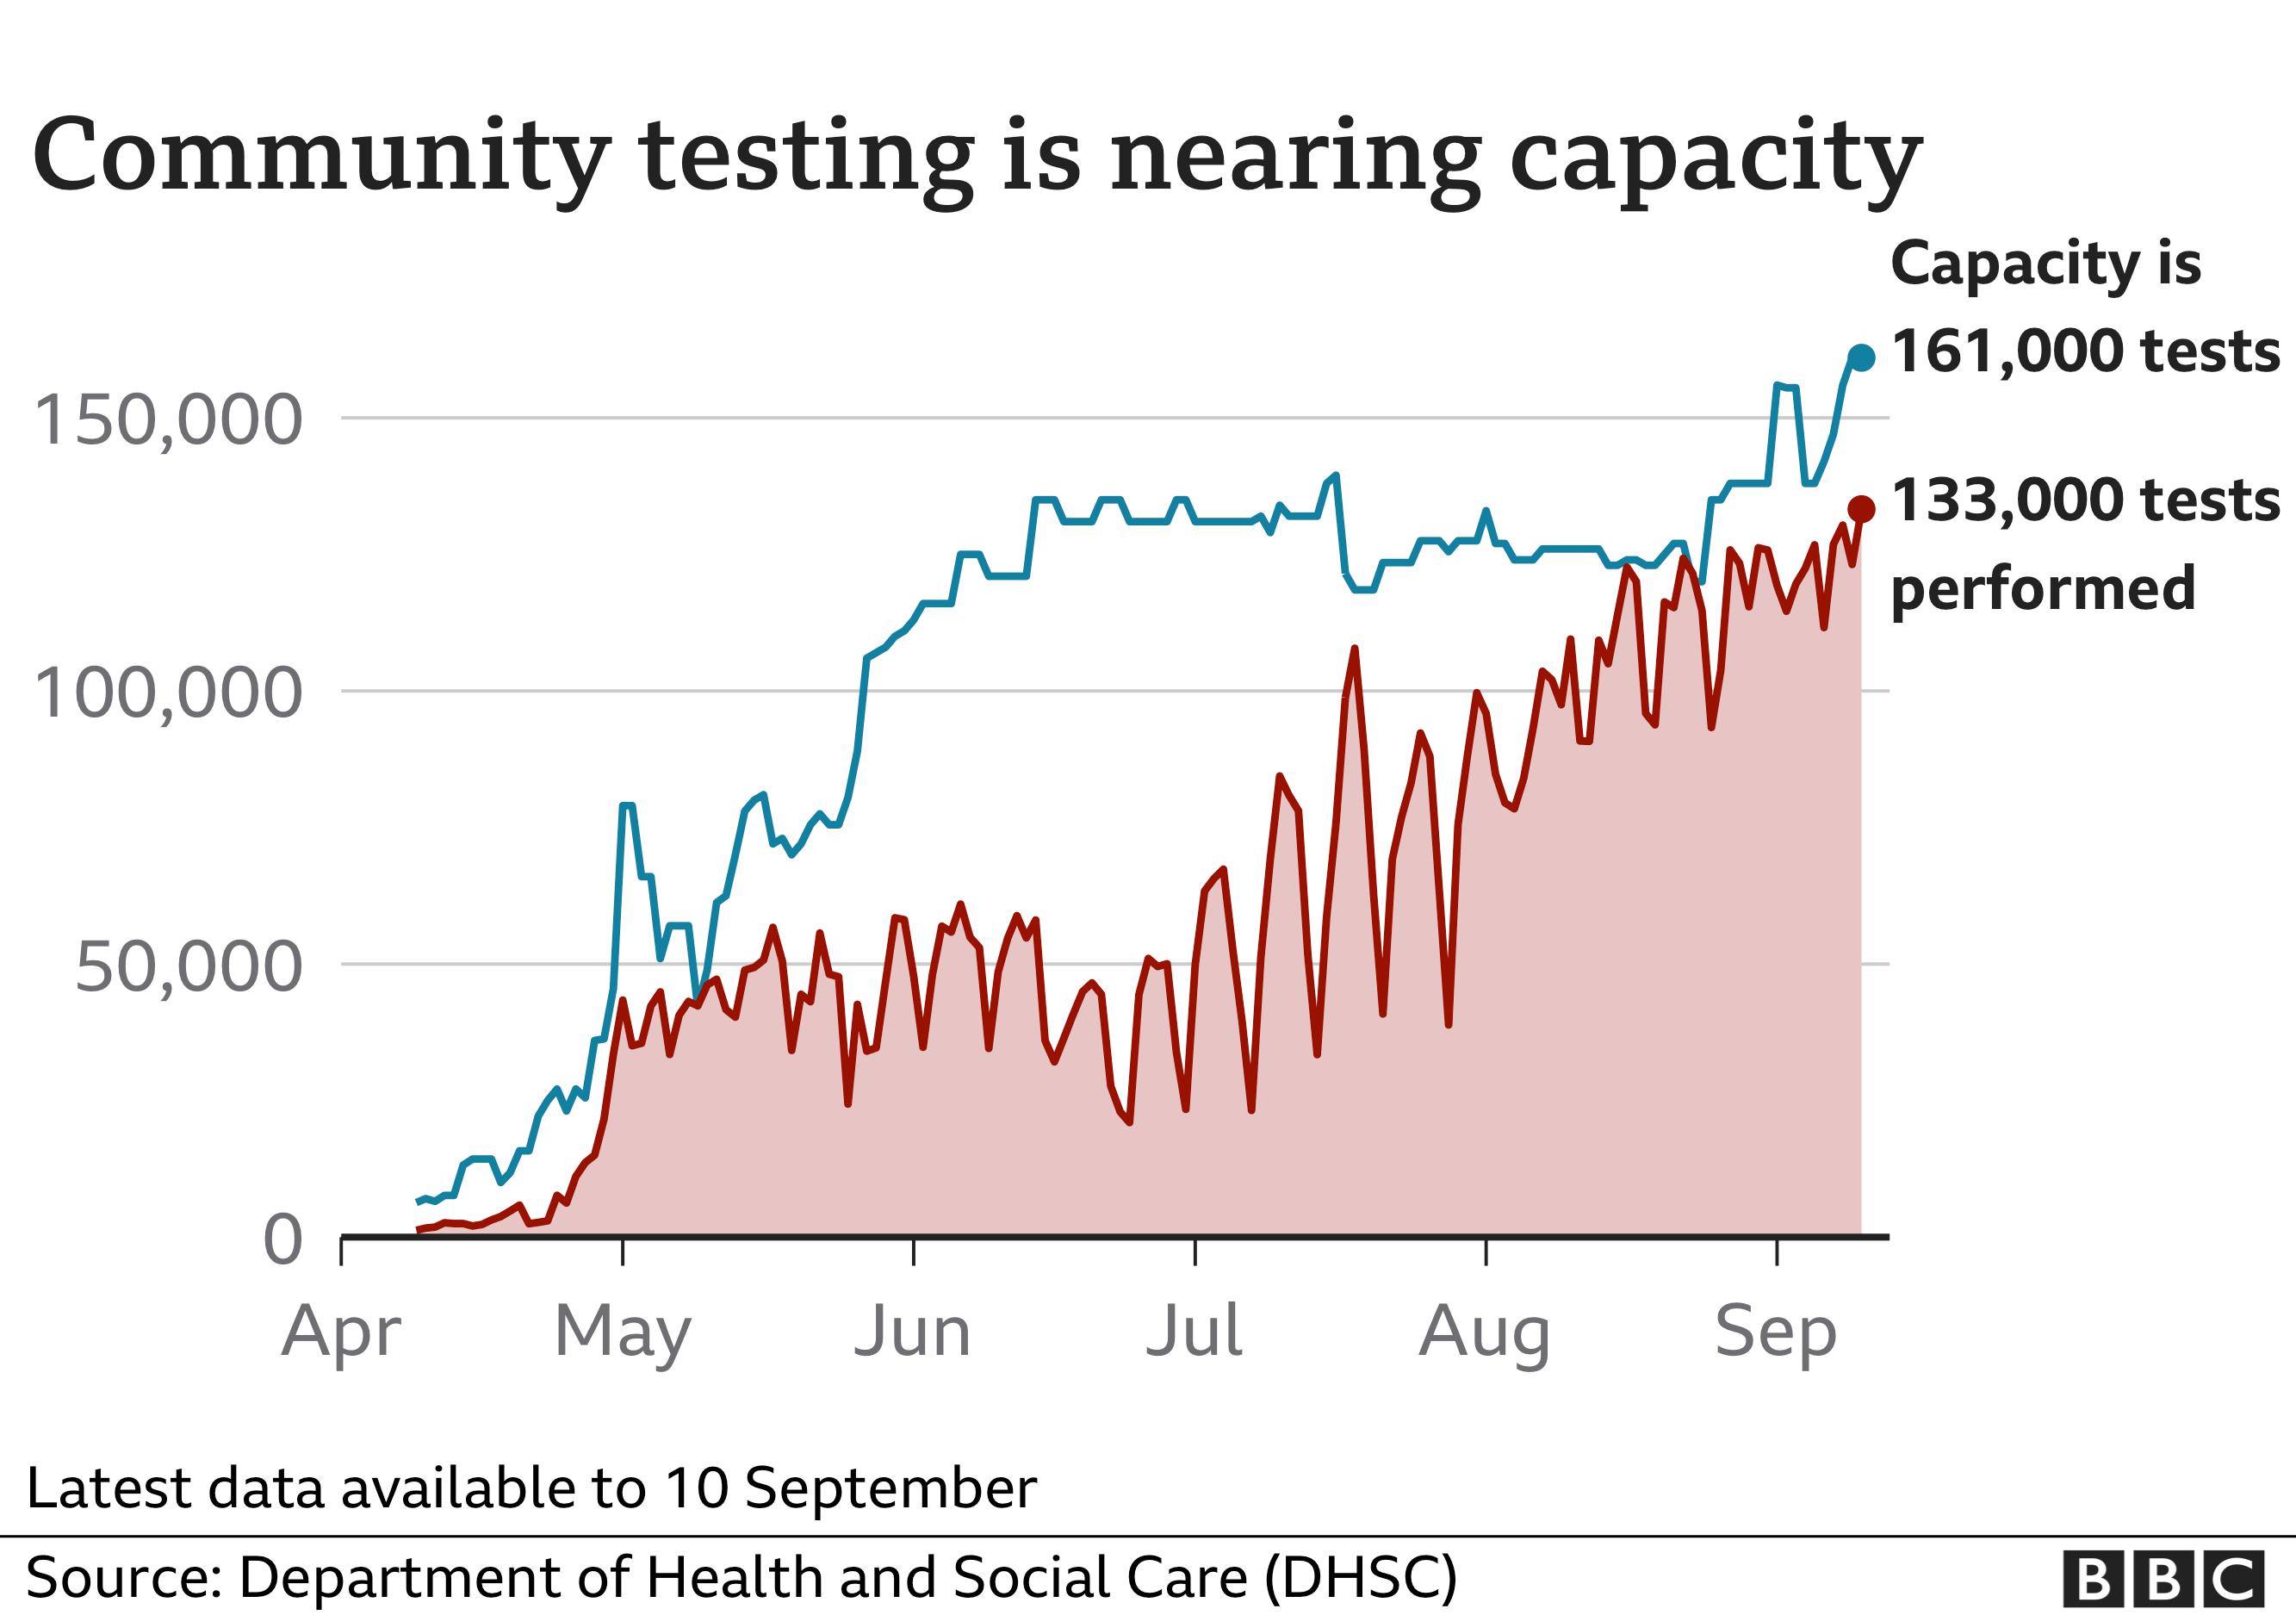 COVID testing capacity